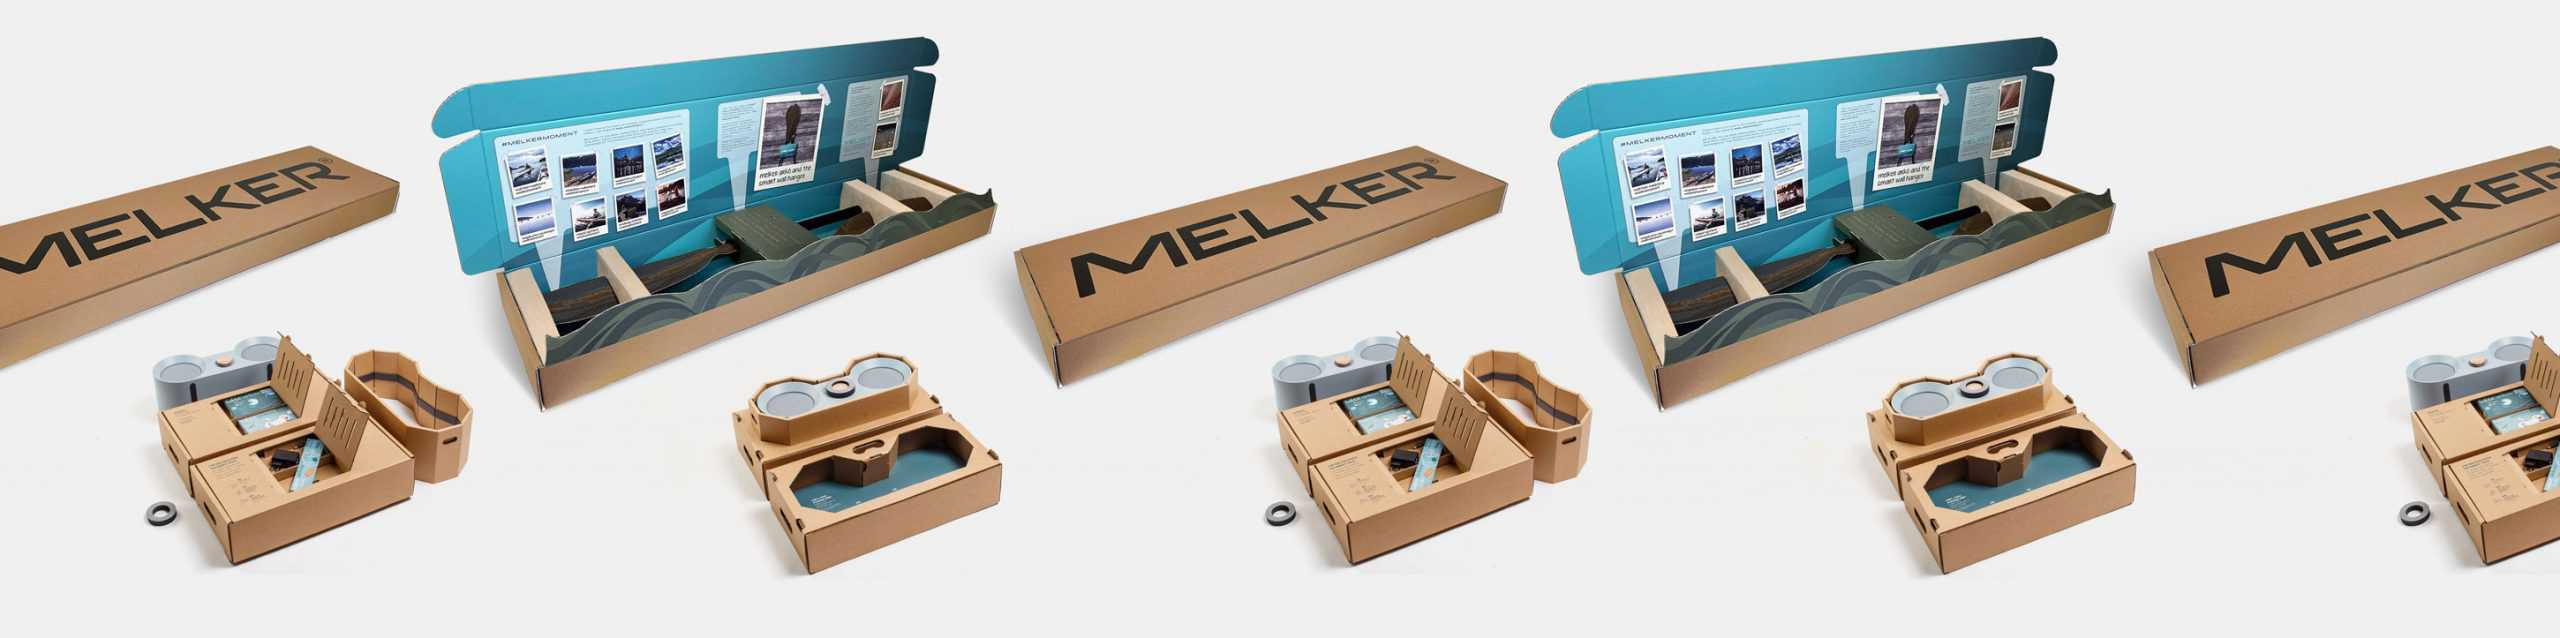 New awarded eco-friendly designs by Stora Enso